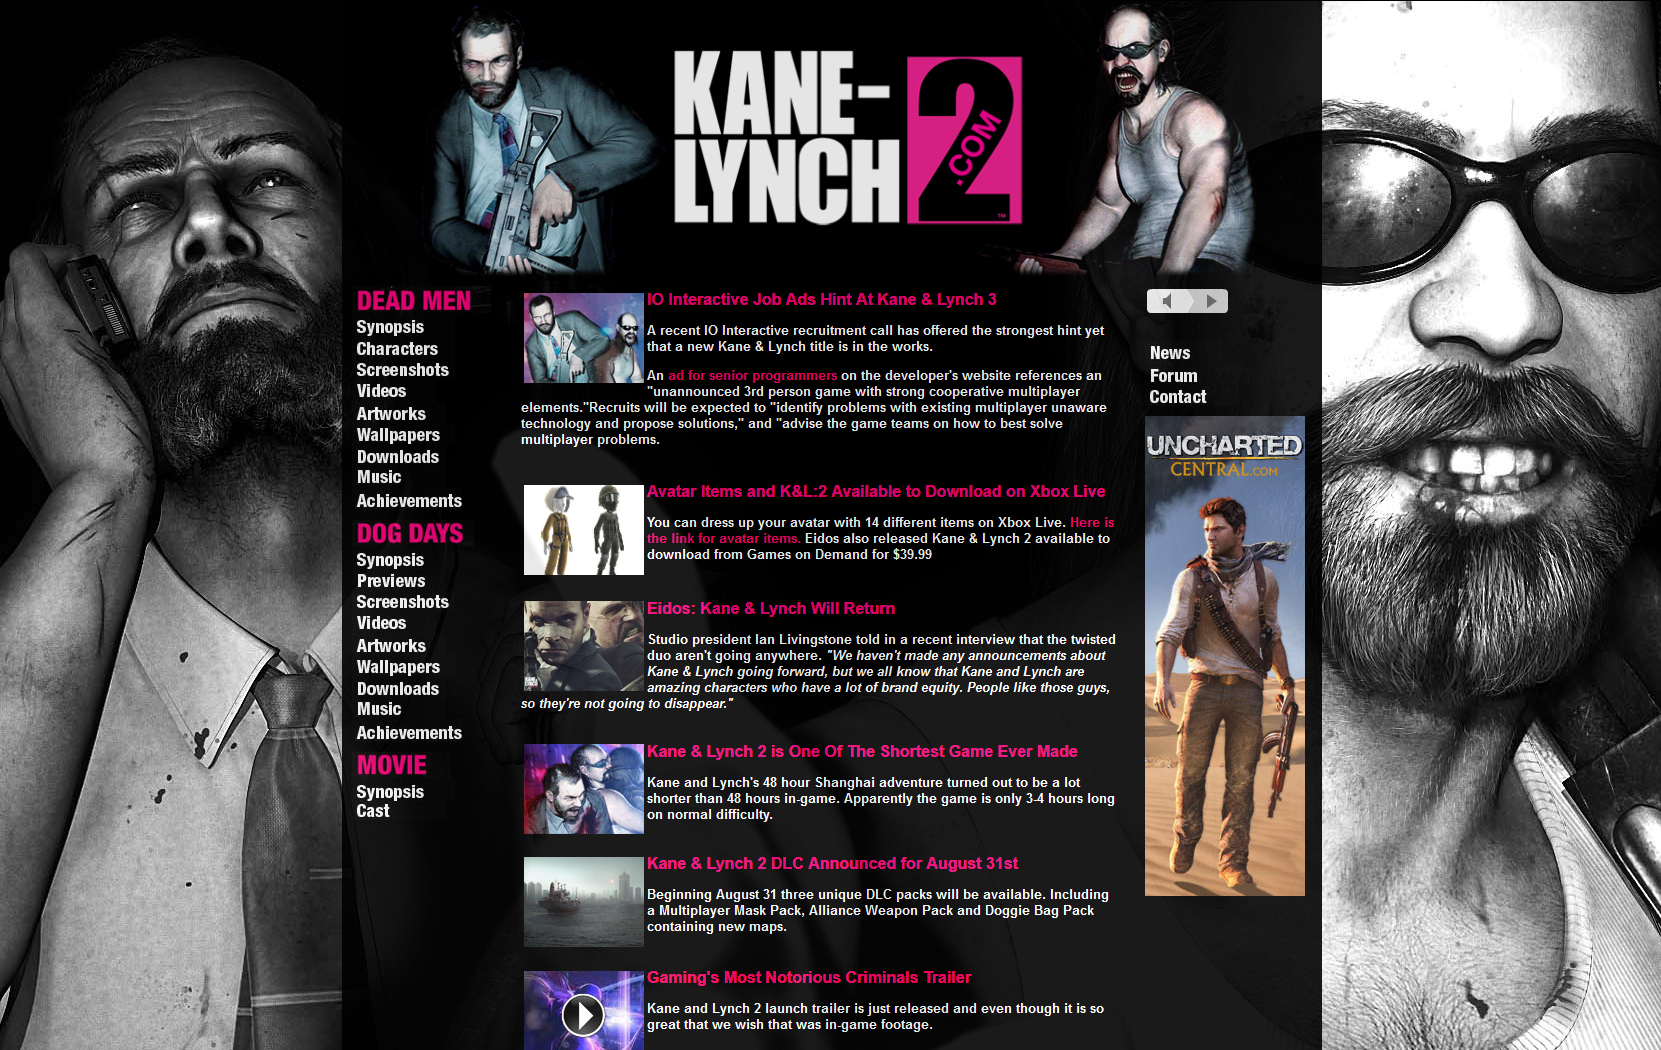 Название: kane and lynch: dead men english only жанр: action год выхода: 2007 язык